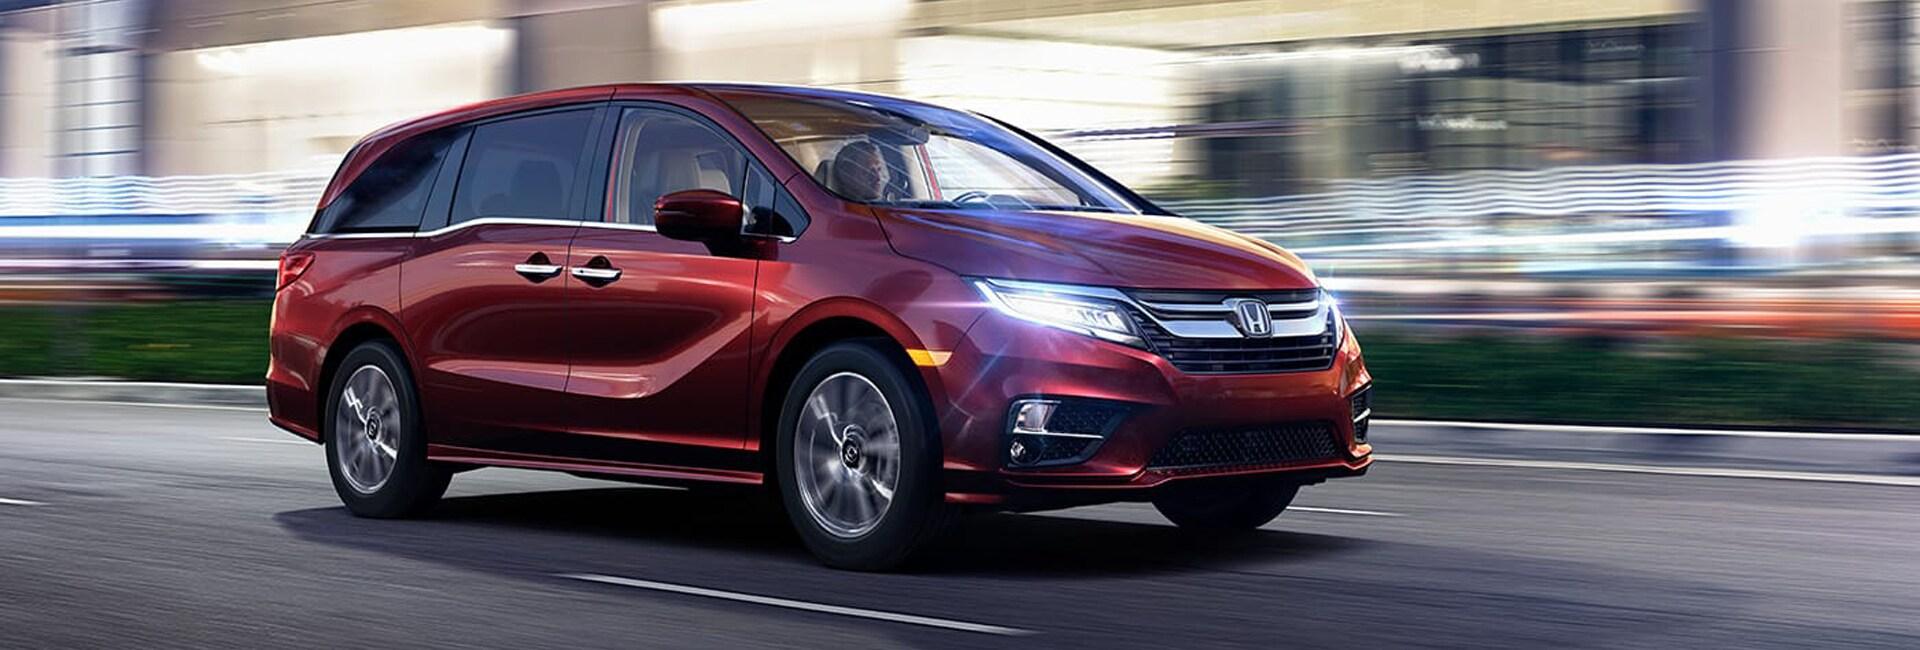 New Honda Odyssey Red Exterior Off Road